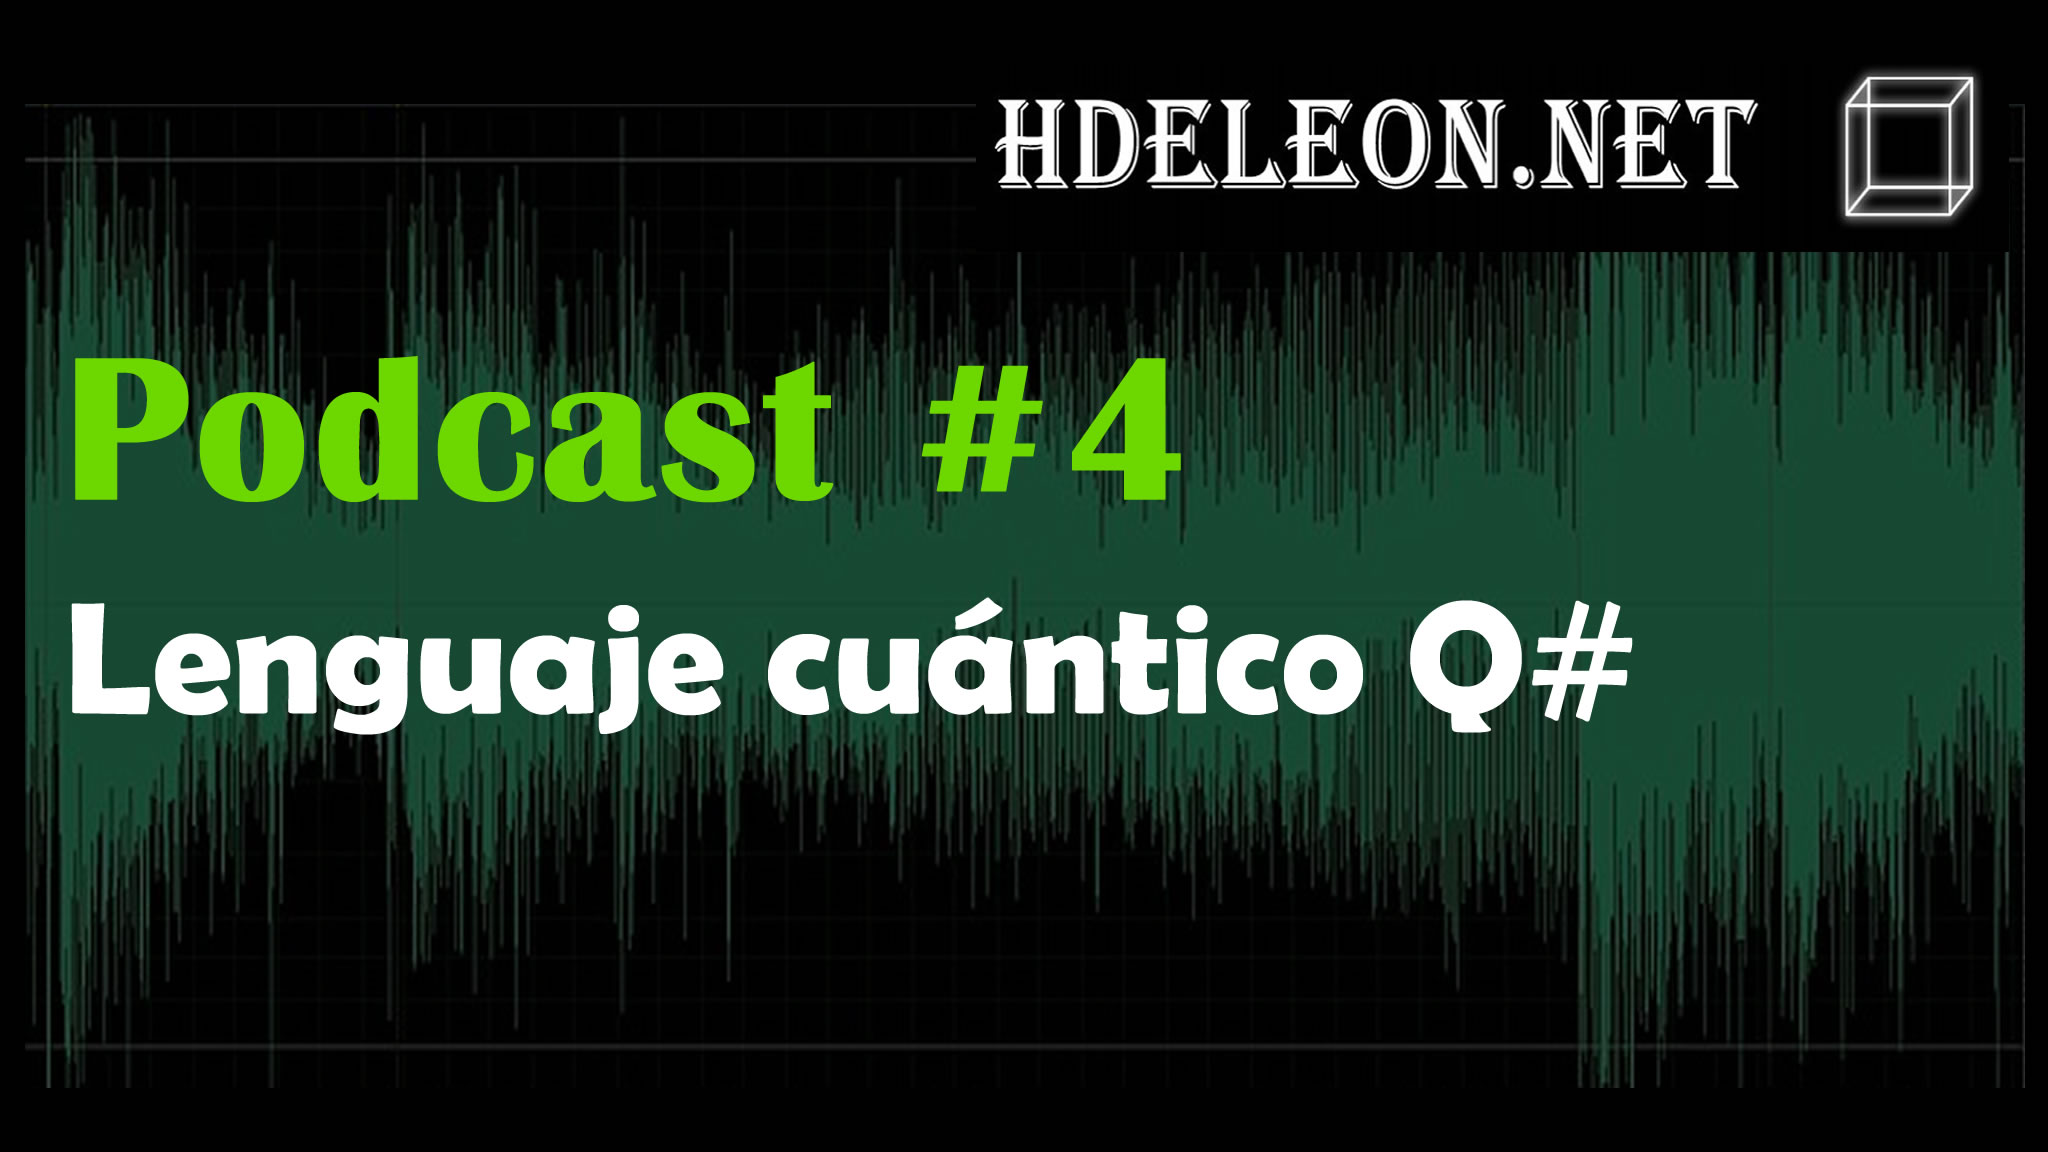 Podcast #4 – Lenguaje cuántico Q#